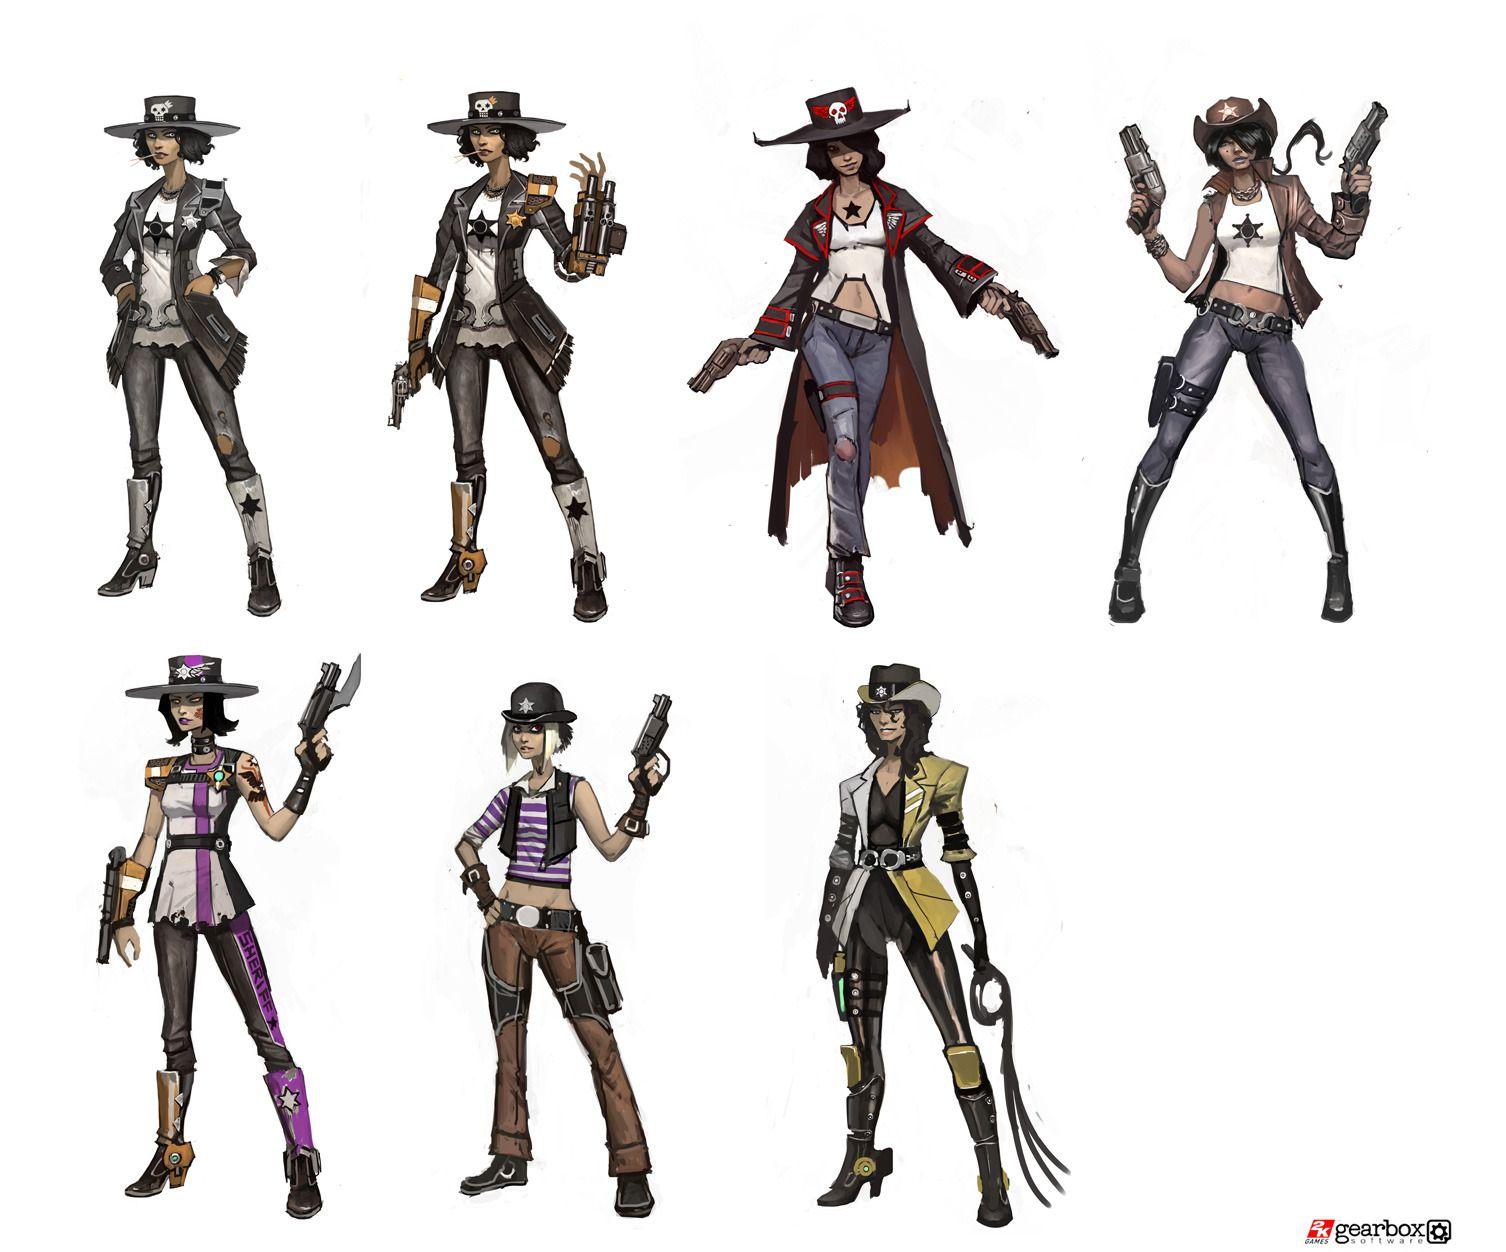 Character Design Process Pdf : Borderlands concept art ref character design